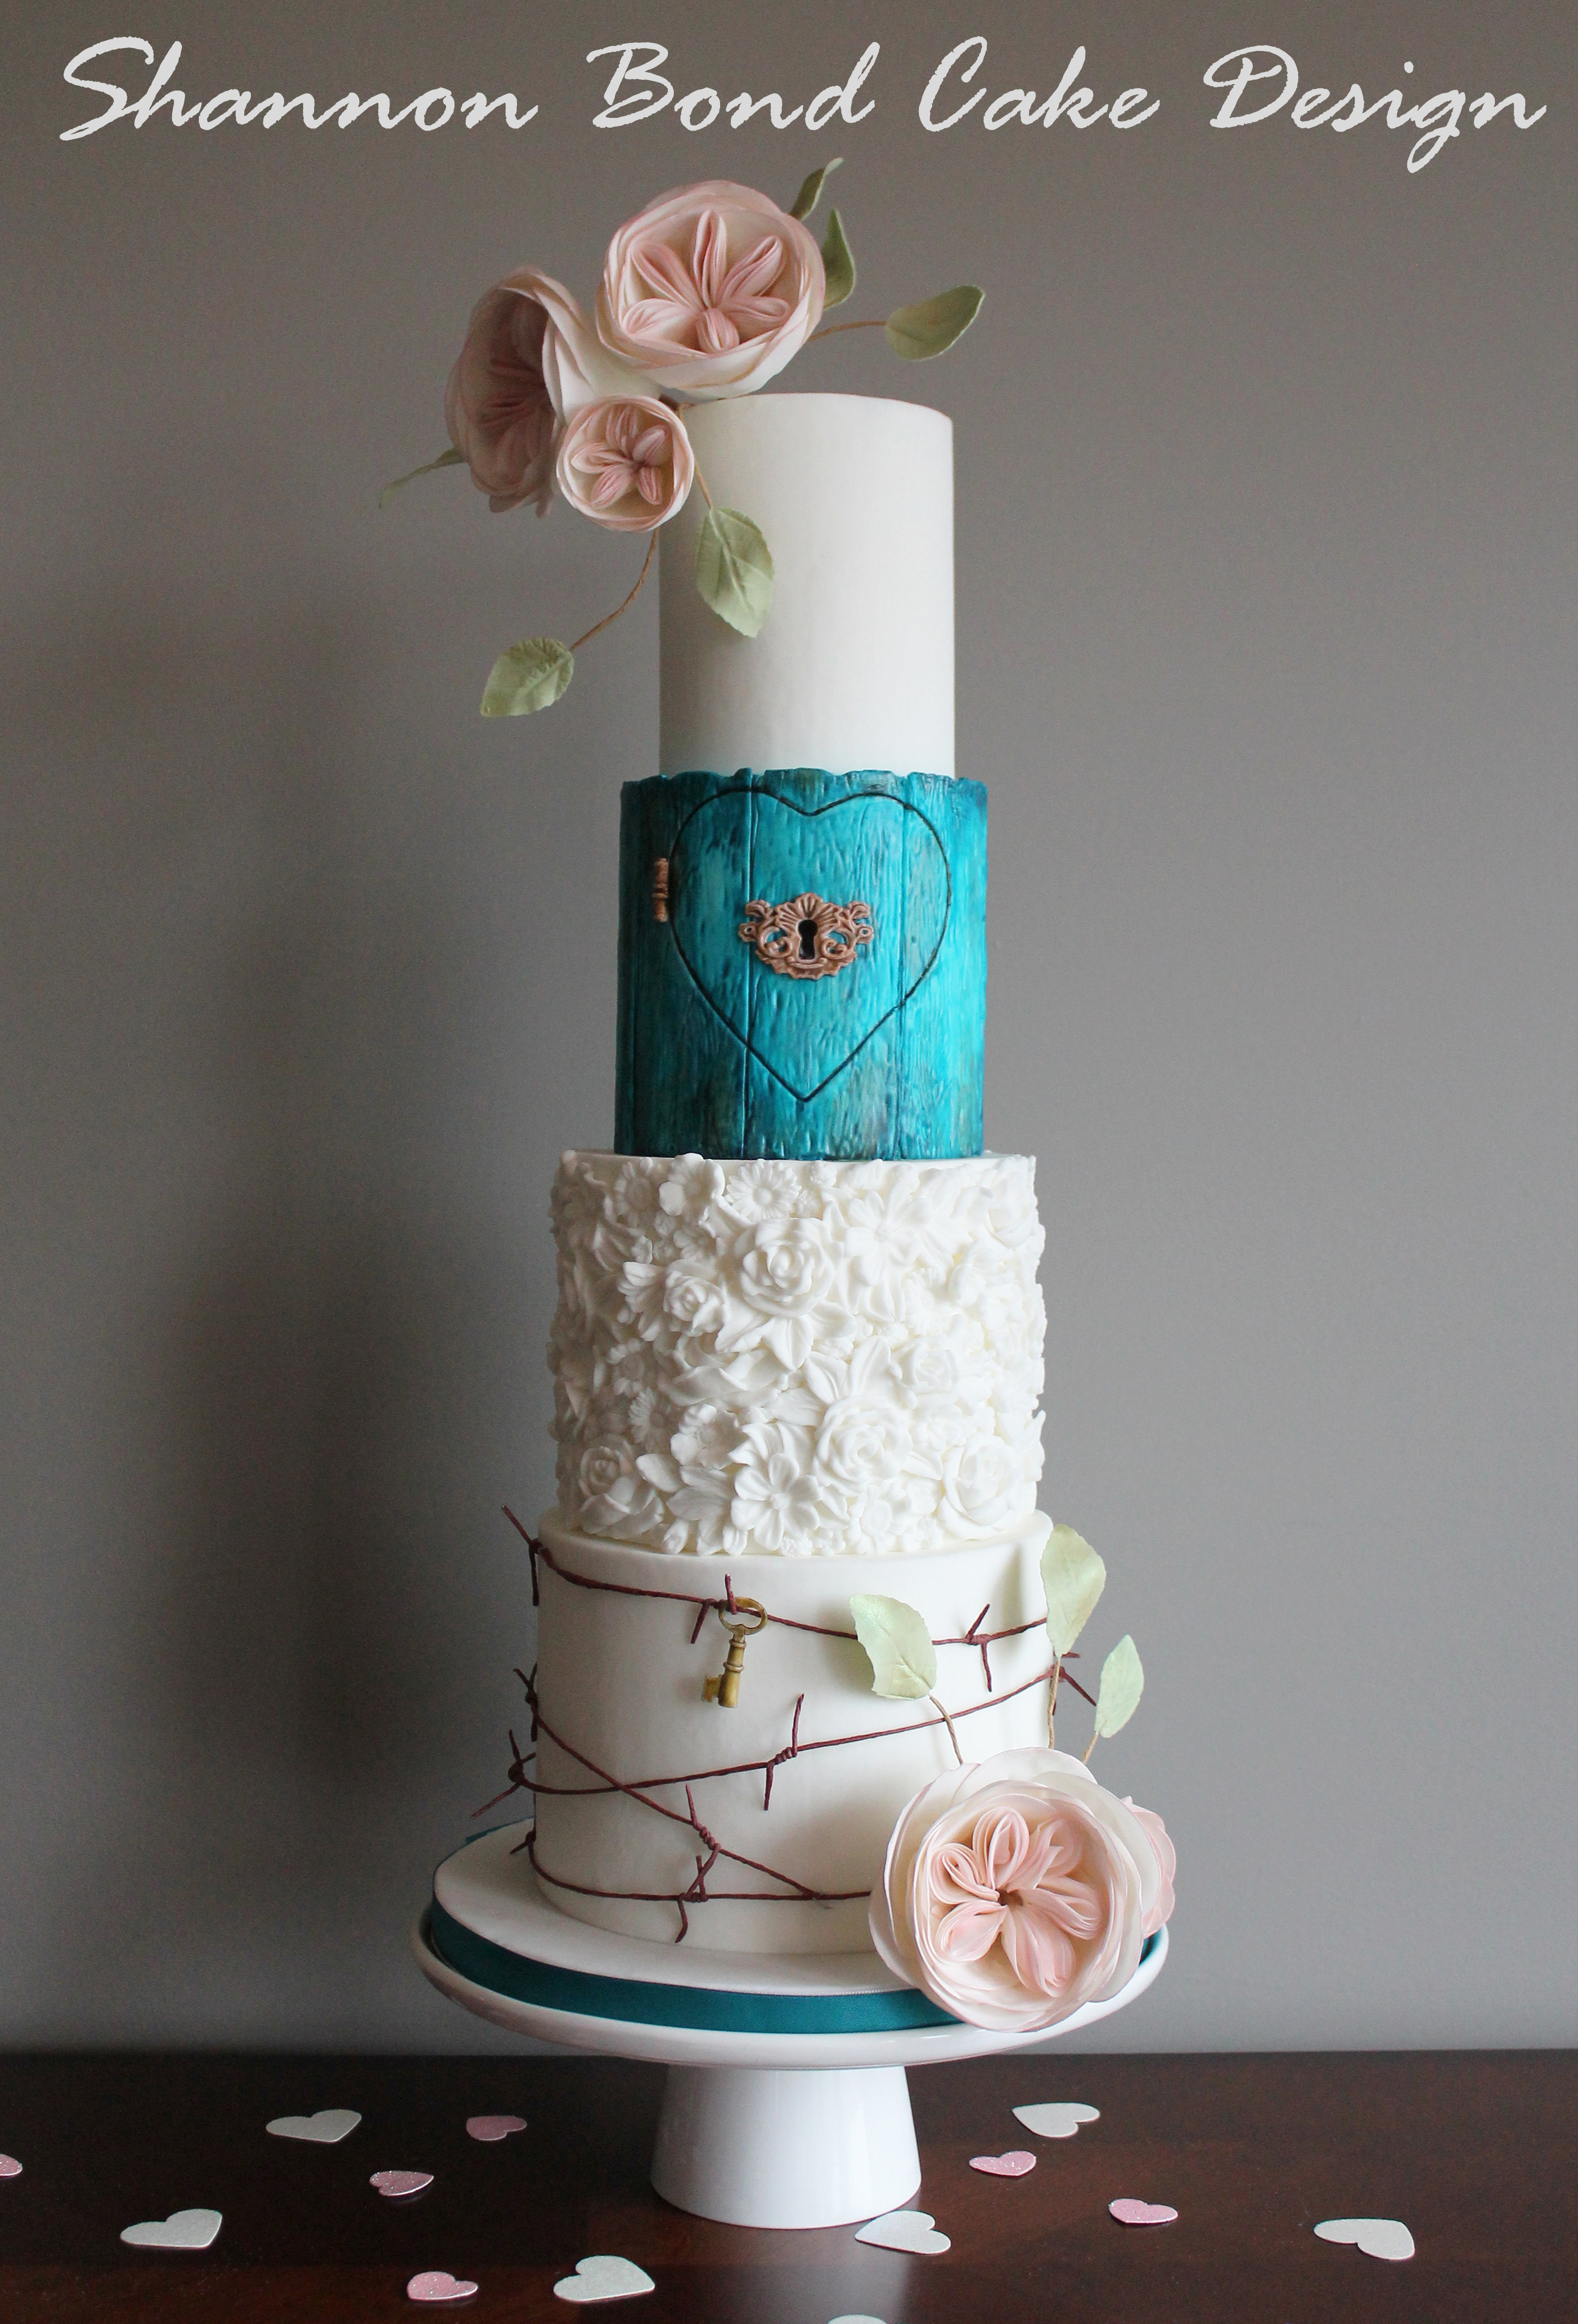 a kansas city wedding cake inspired by the country shannon bond cake design kansas city. Black Bedroom Furniture Sets. Home Design Ideas